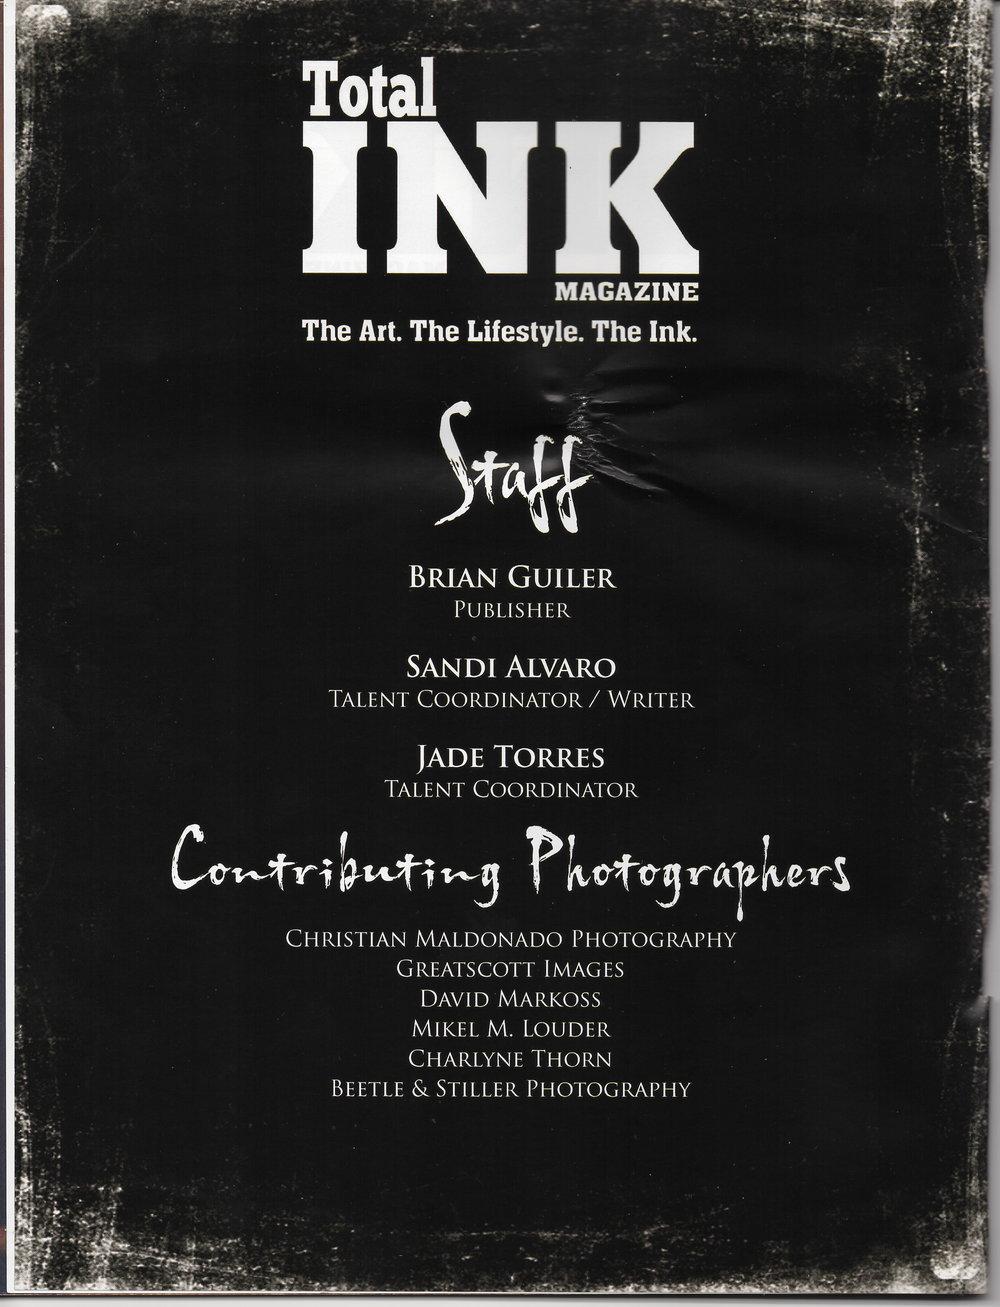 Total Ink Magaine_4.jpg